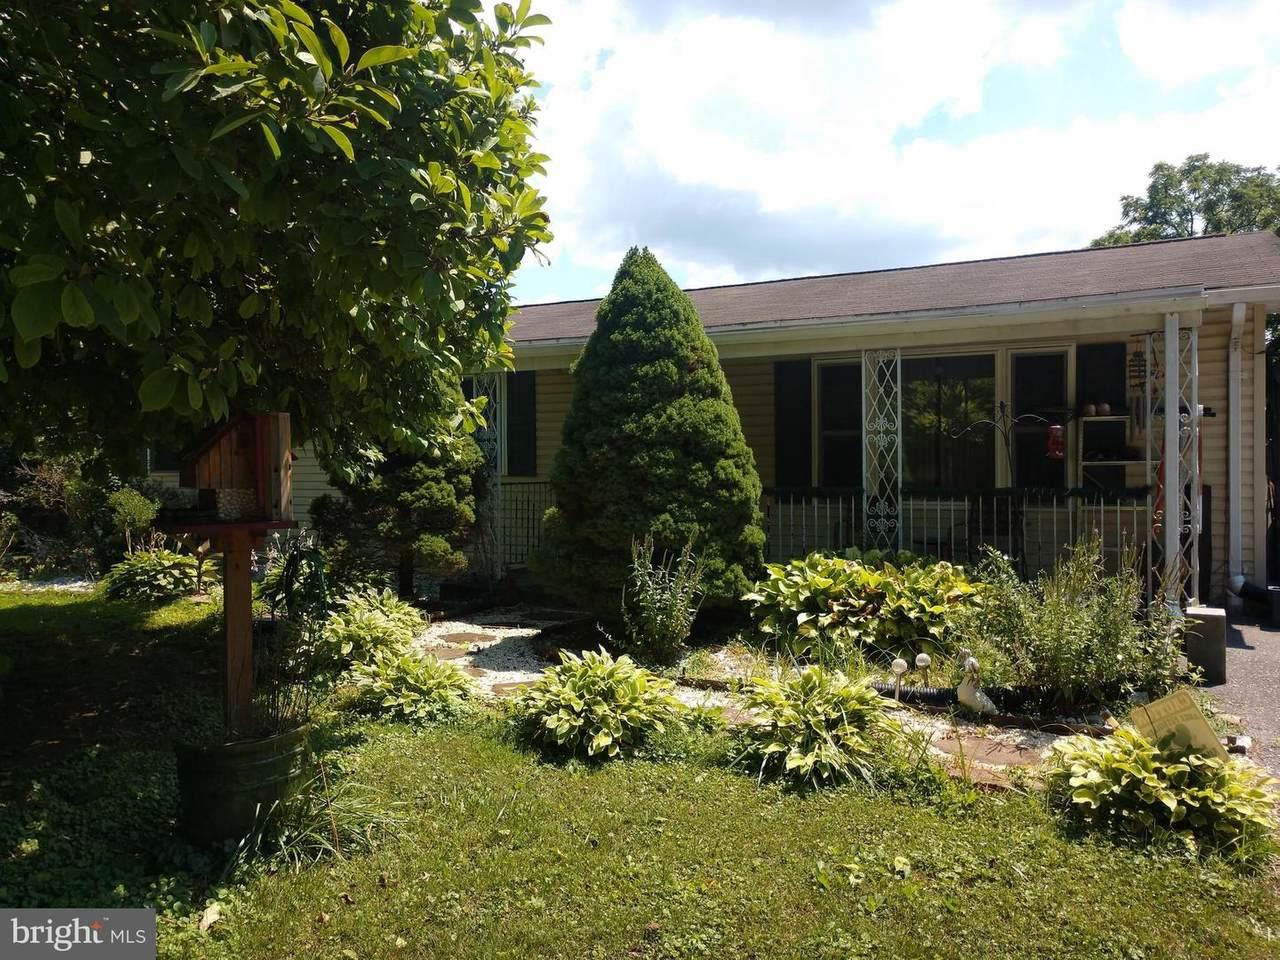 9931 Garis Shop Road - Photo 1